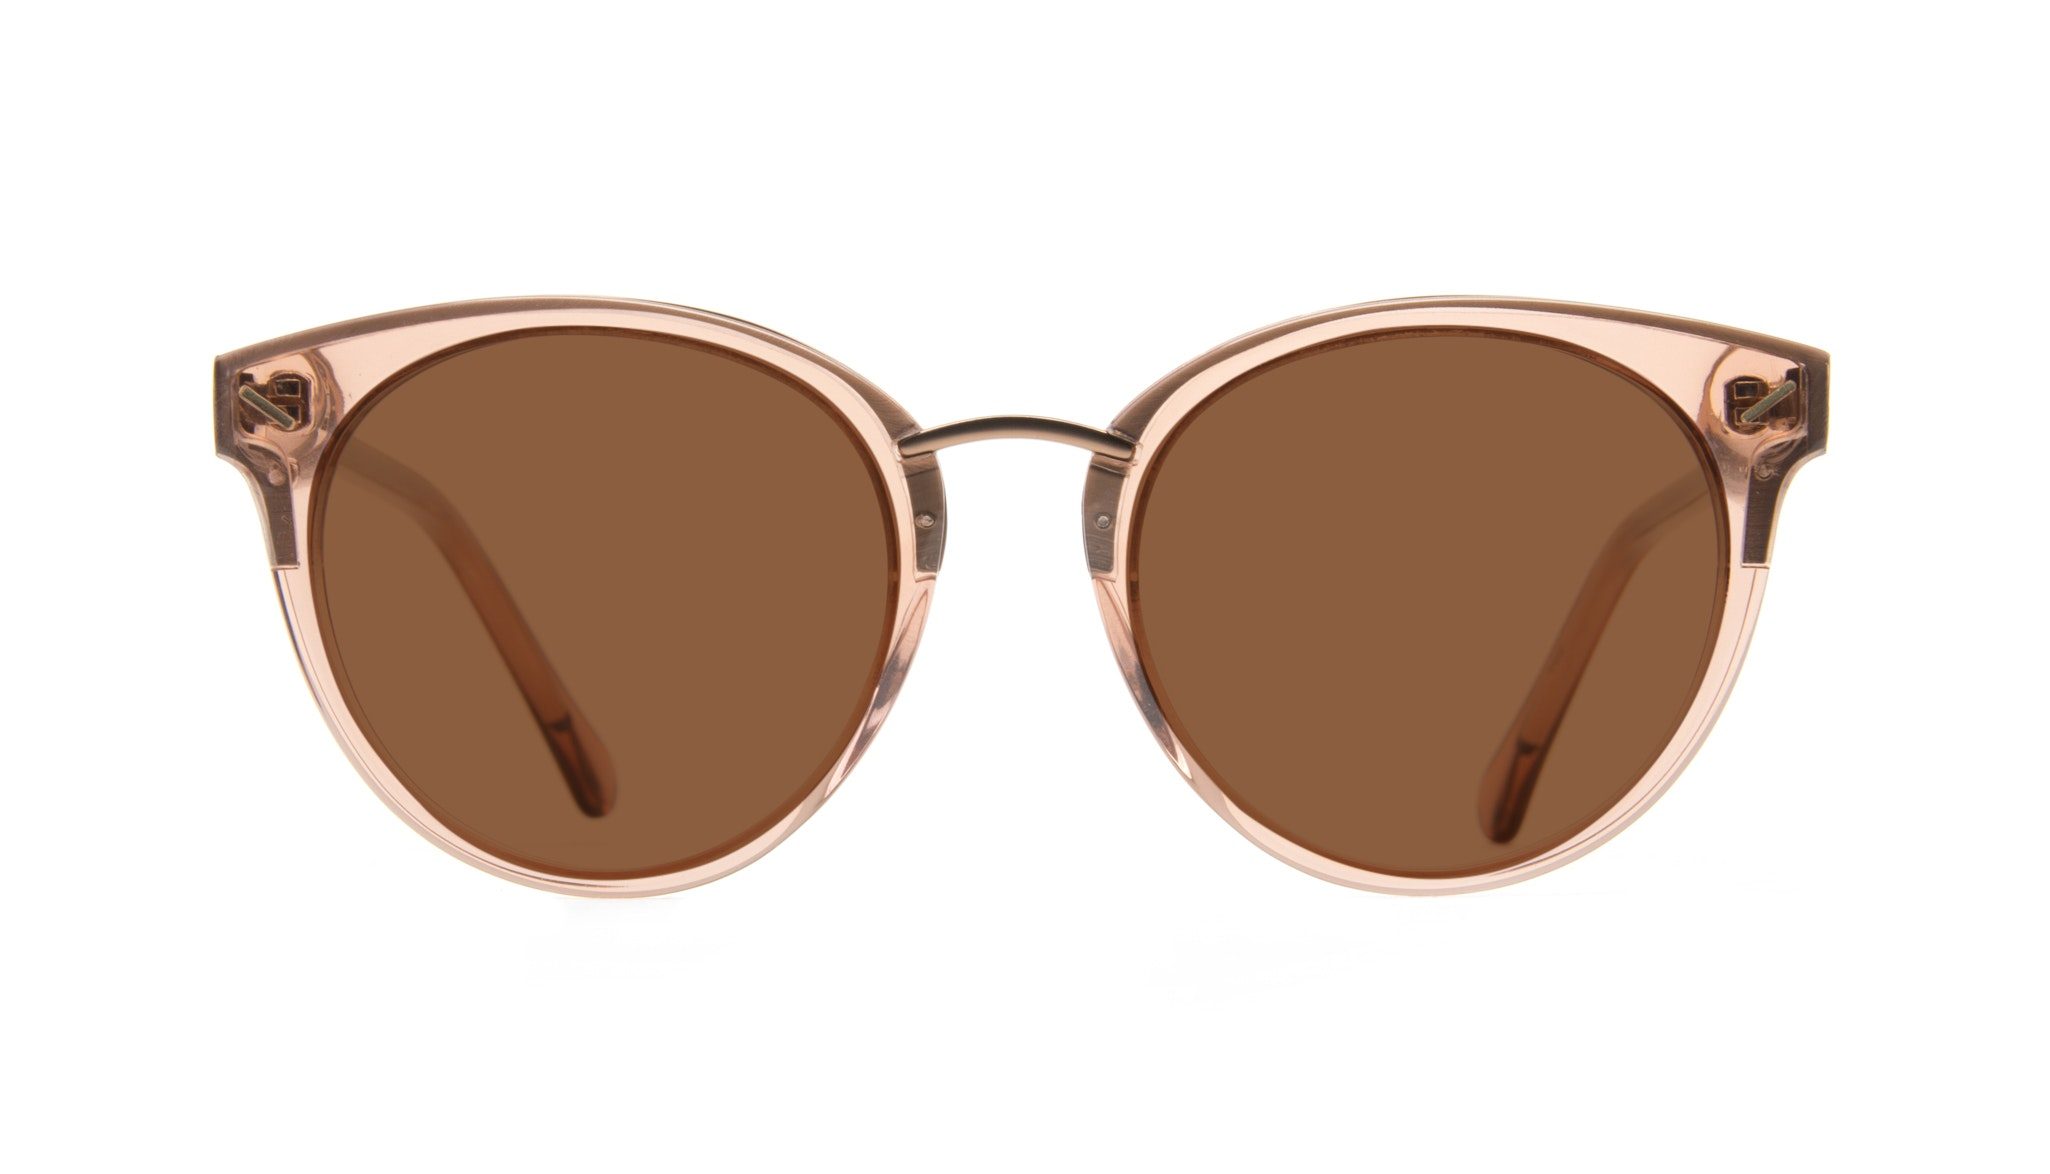 Affordable Fashion Glasses Round Eyeglasses Women Element Rose